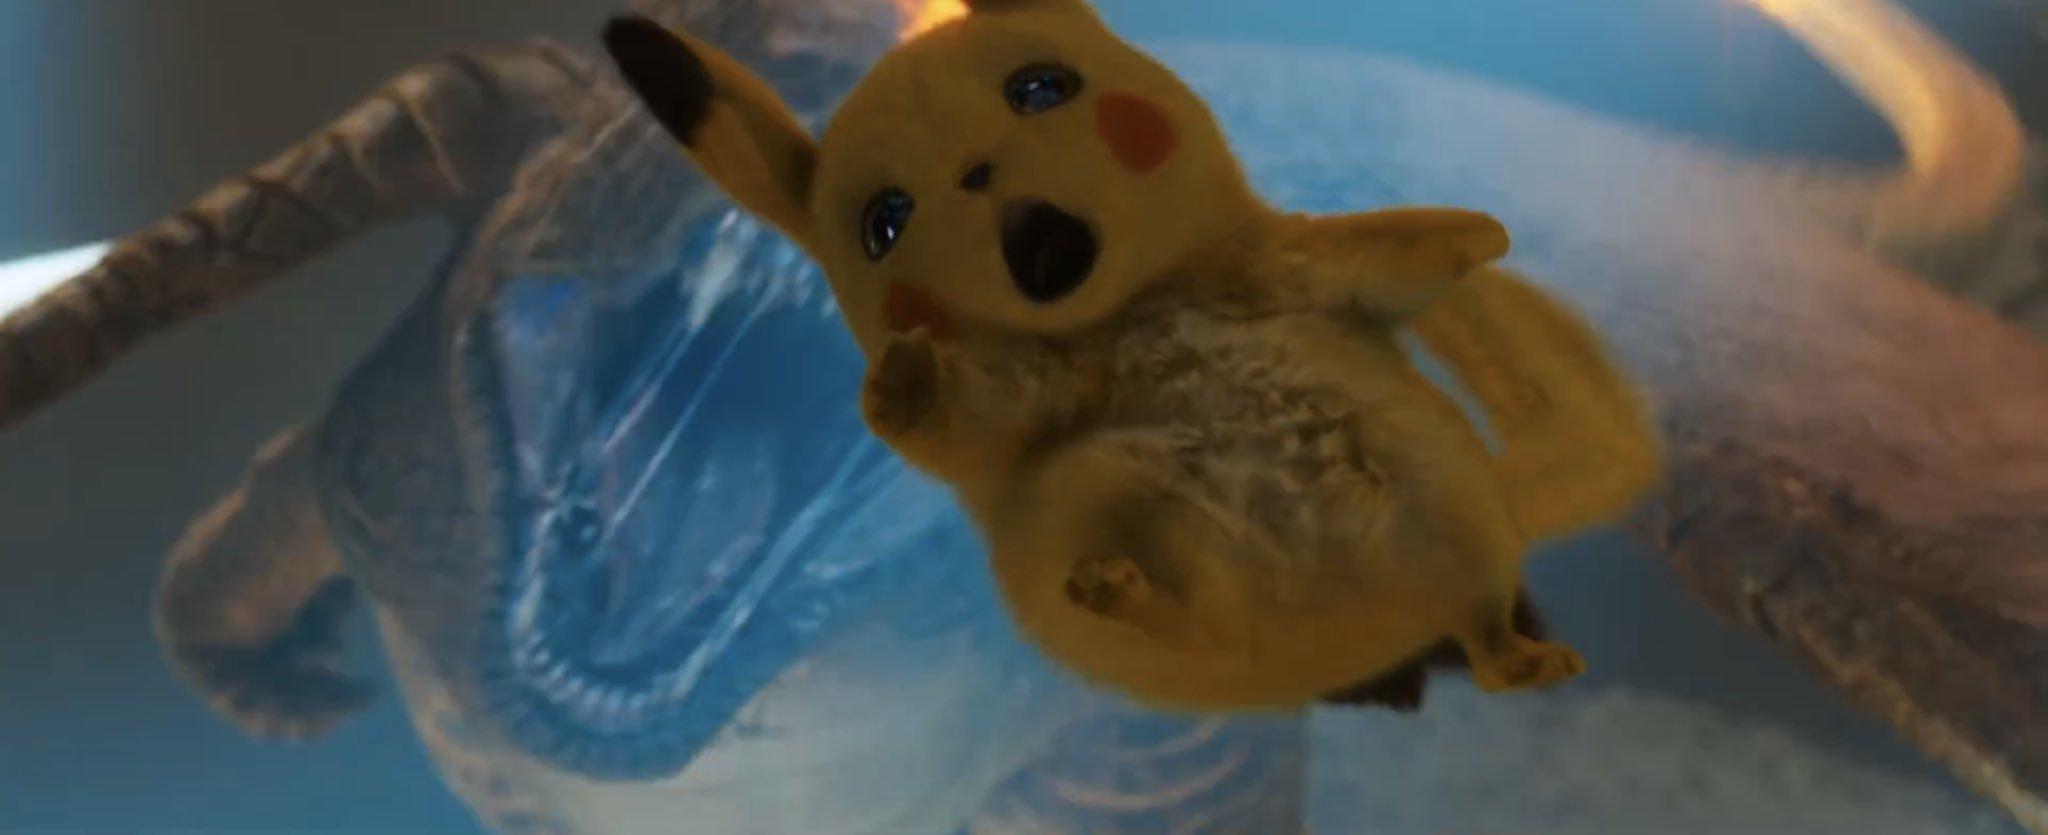 Pokemon Images: Pokemon Xy Pikachu Vs Charizard